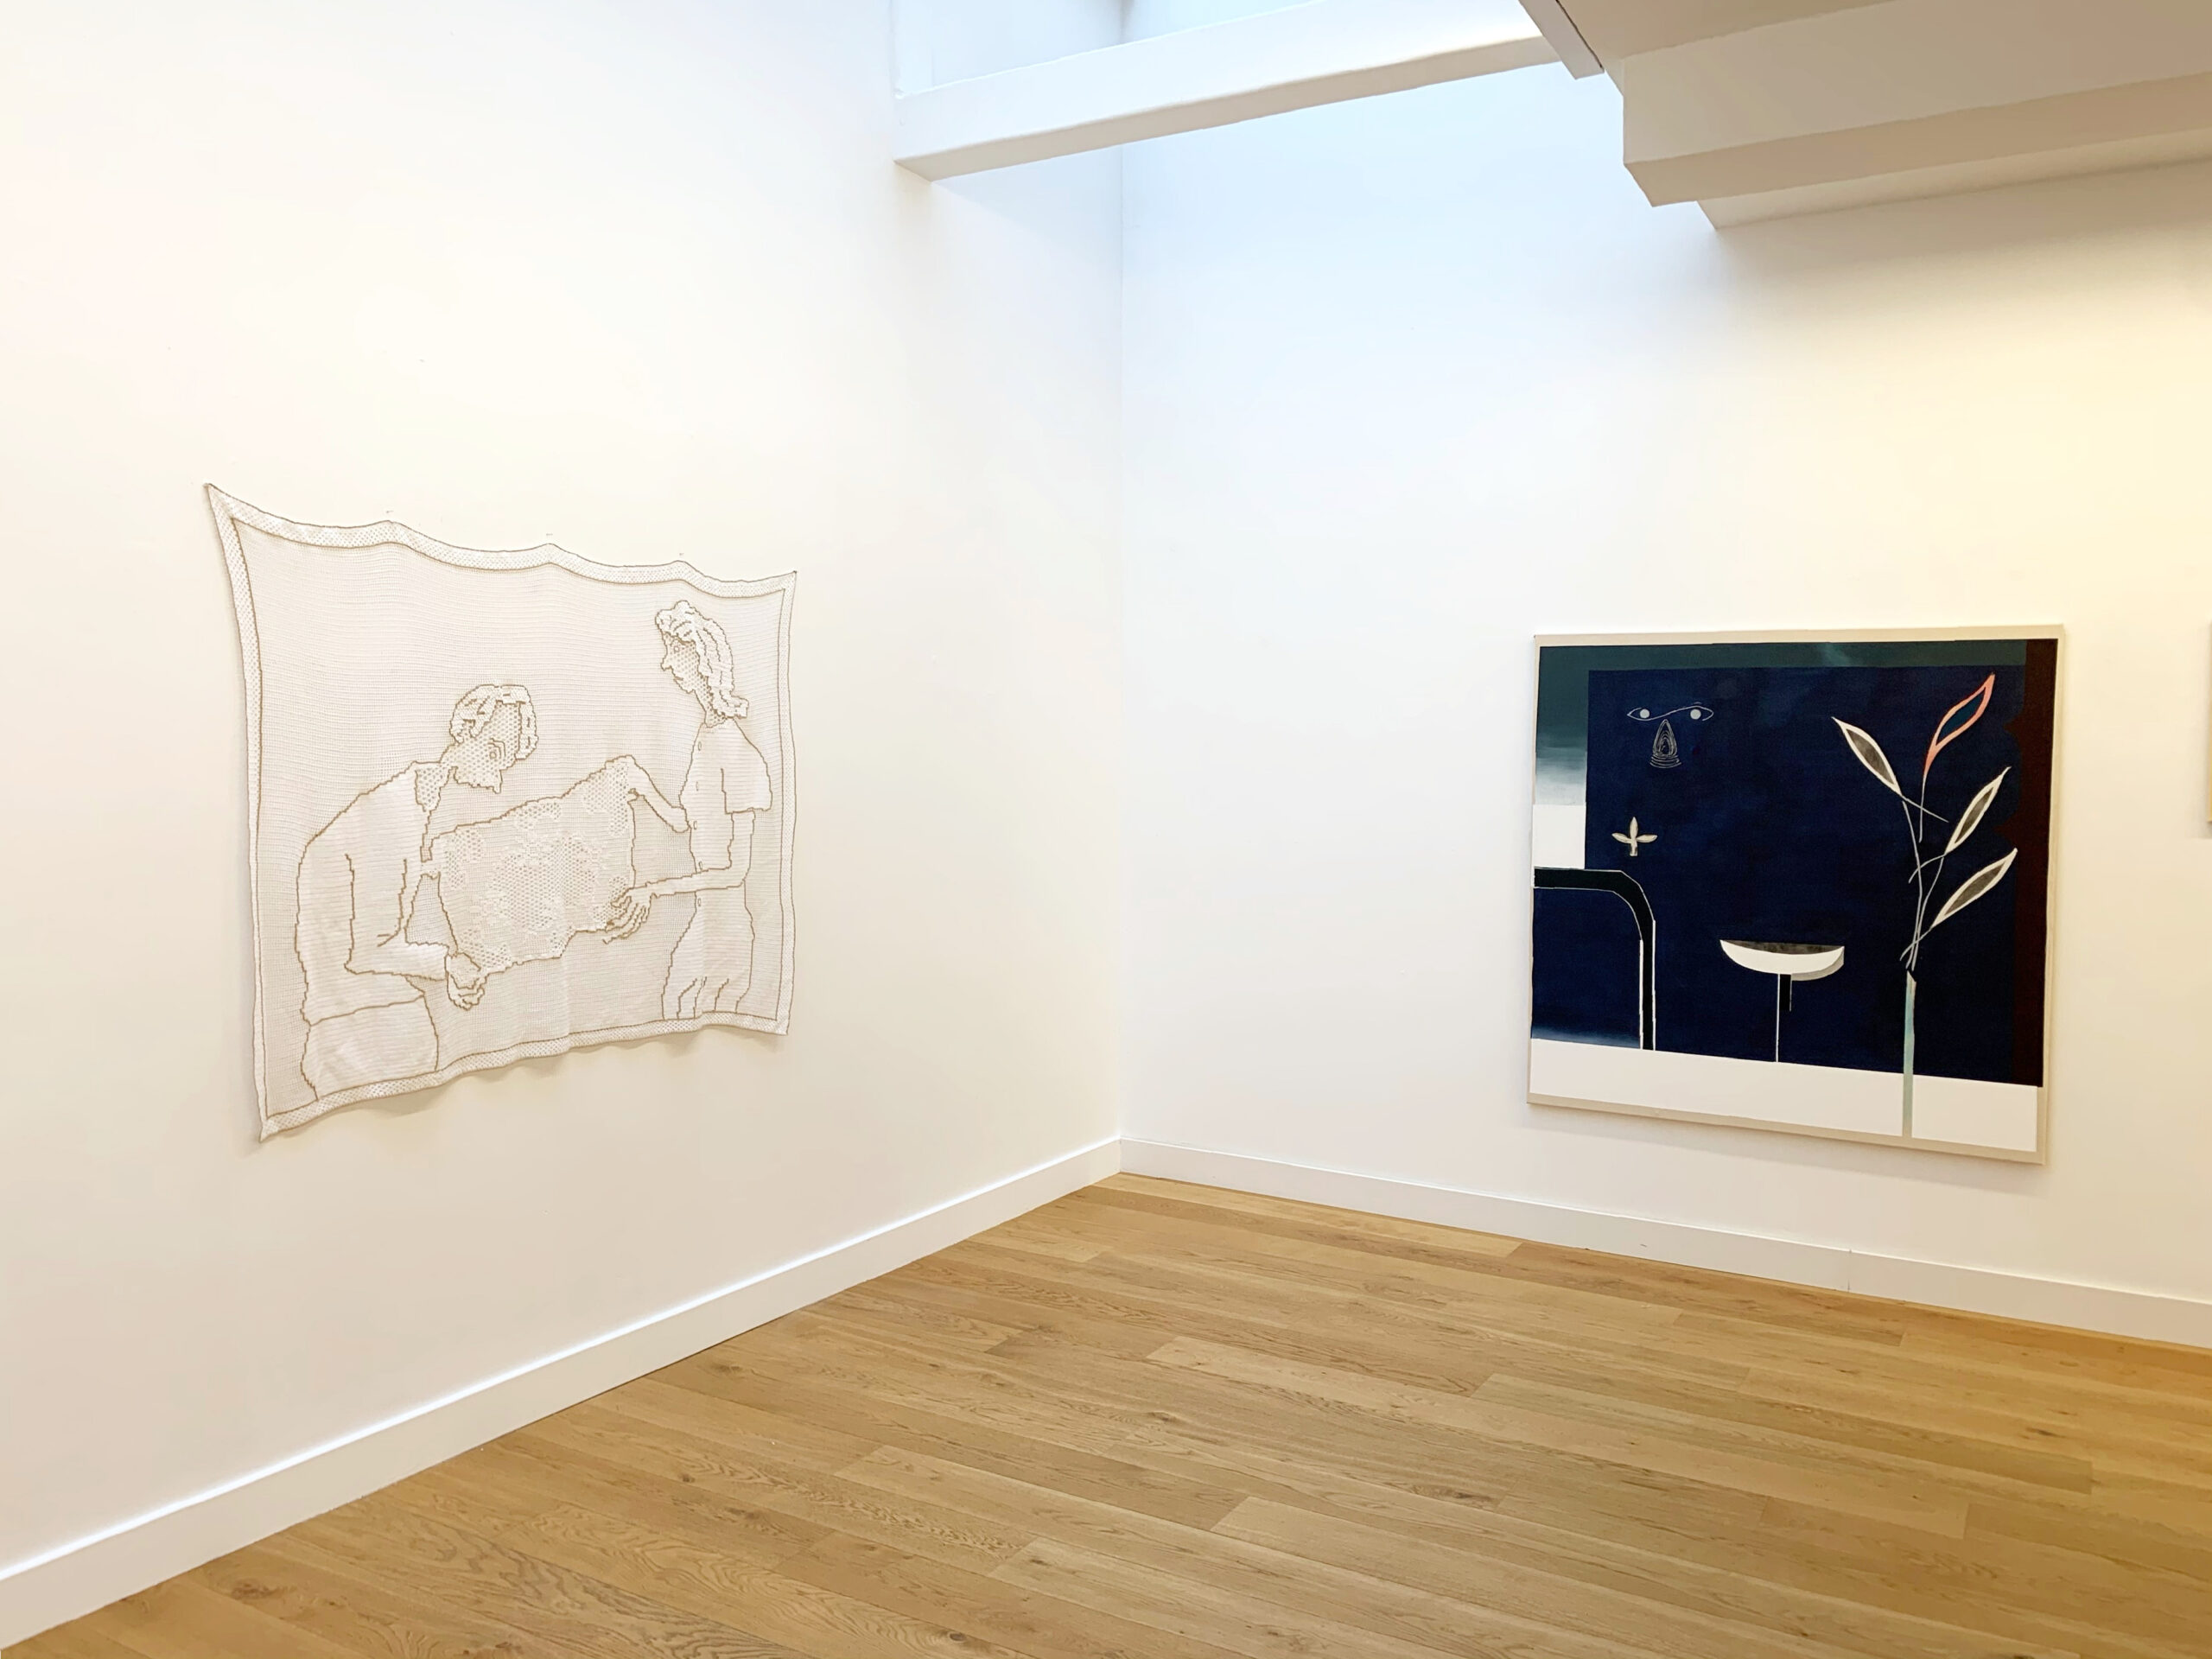 Exhibition view Jakup Ferri - Flatland Gallery Amsterdam